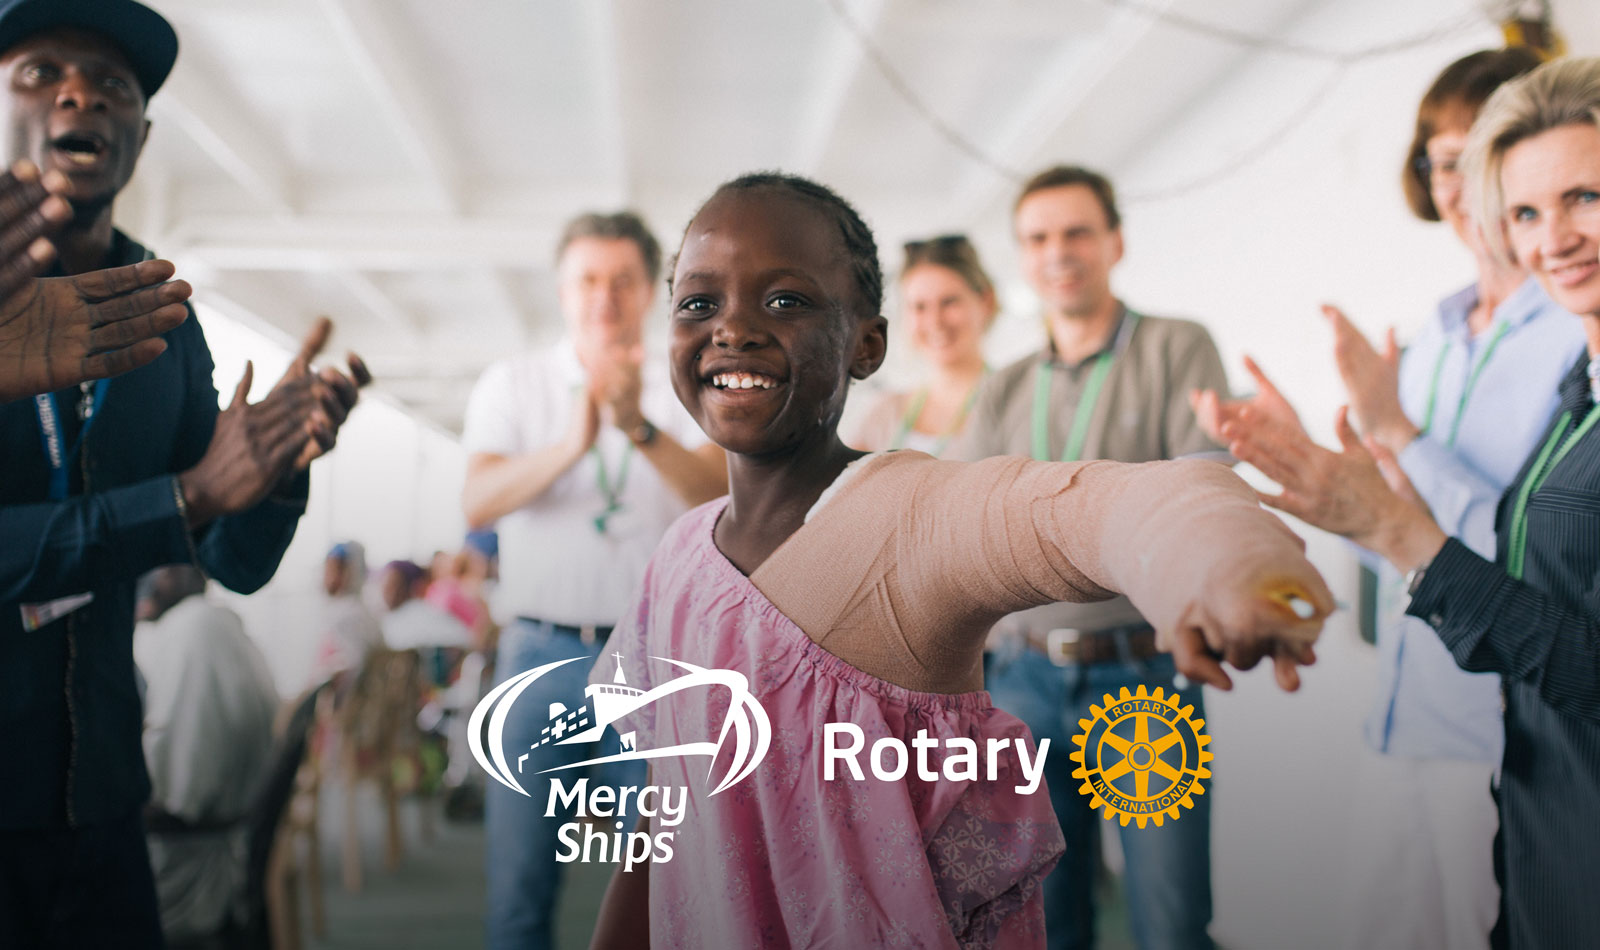 Celebrating the Rotary Grant